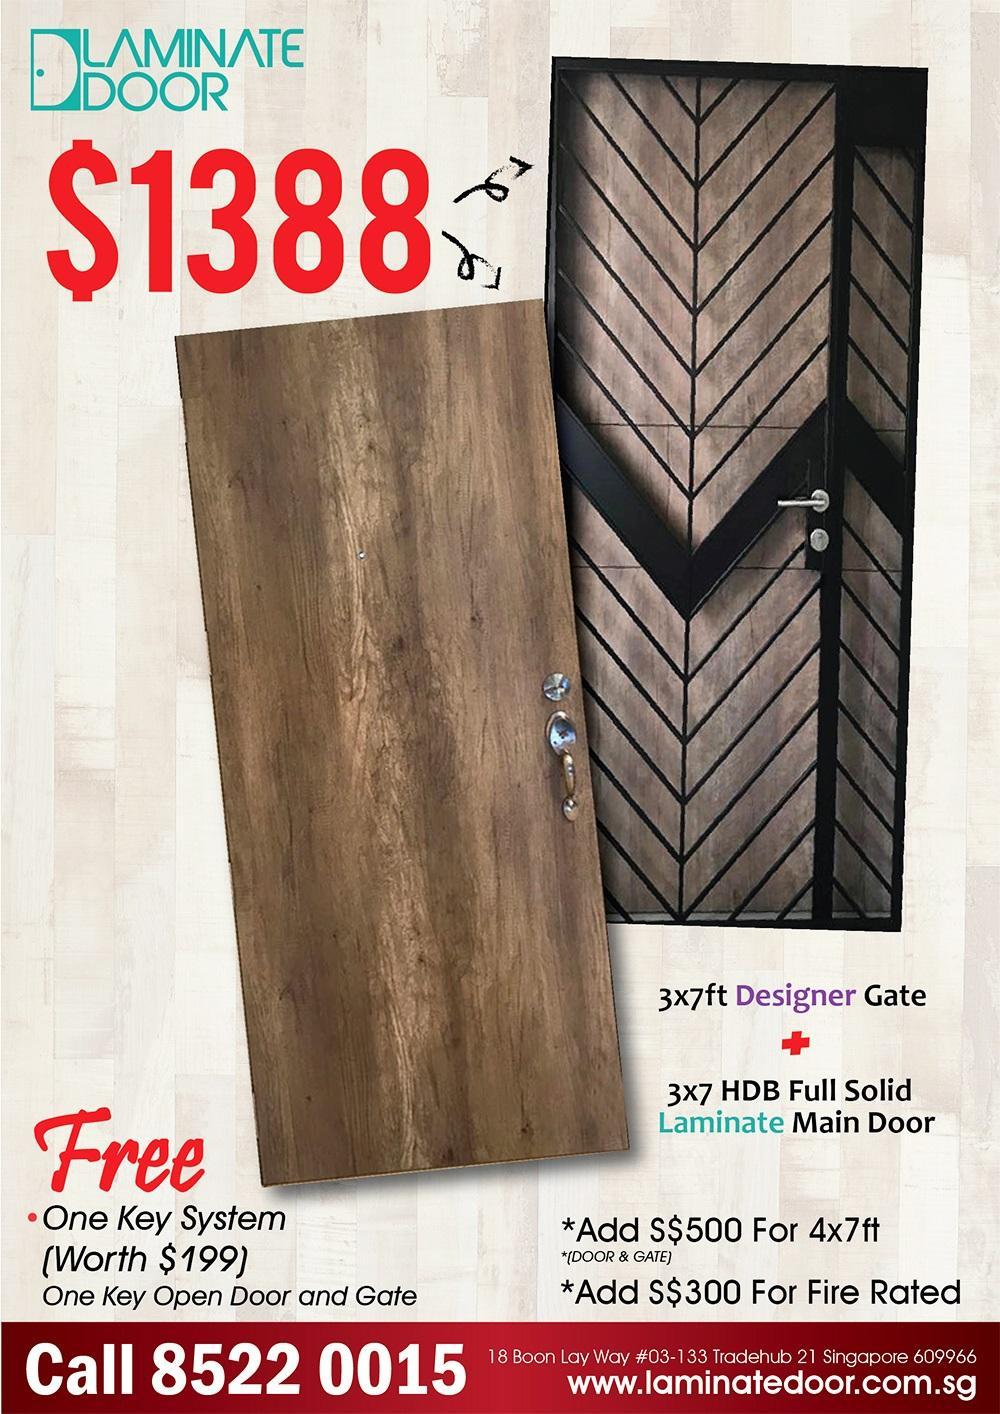 HDB Solid Laminate Main Door + Mild Steel Gate Promotion Package (3x7ft)